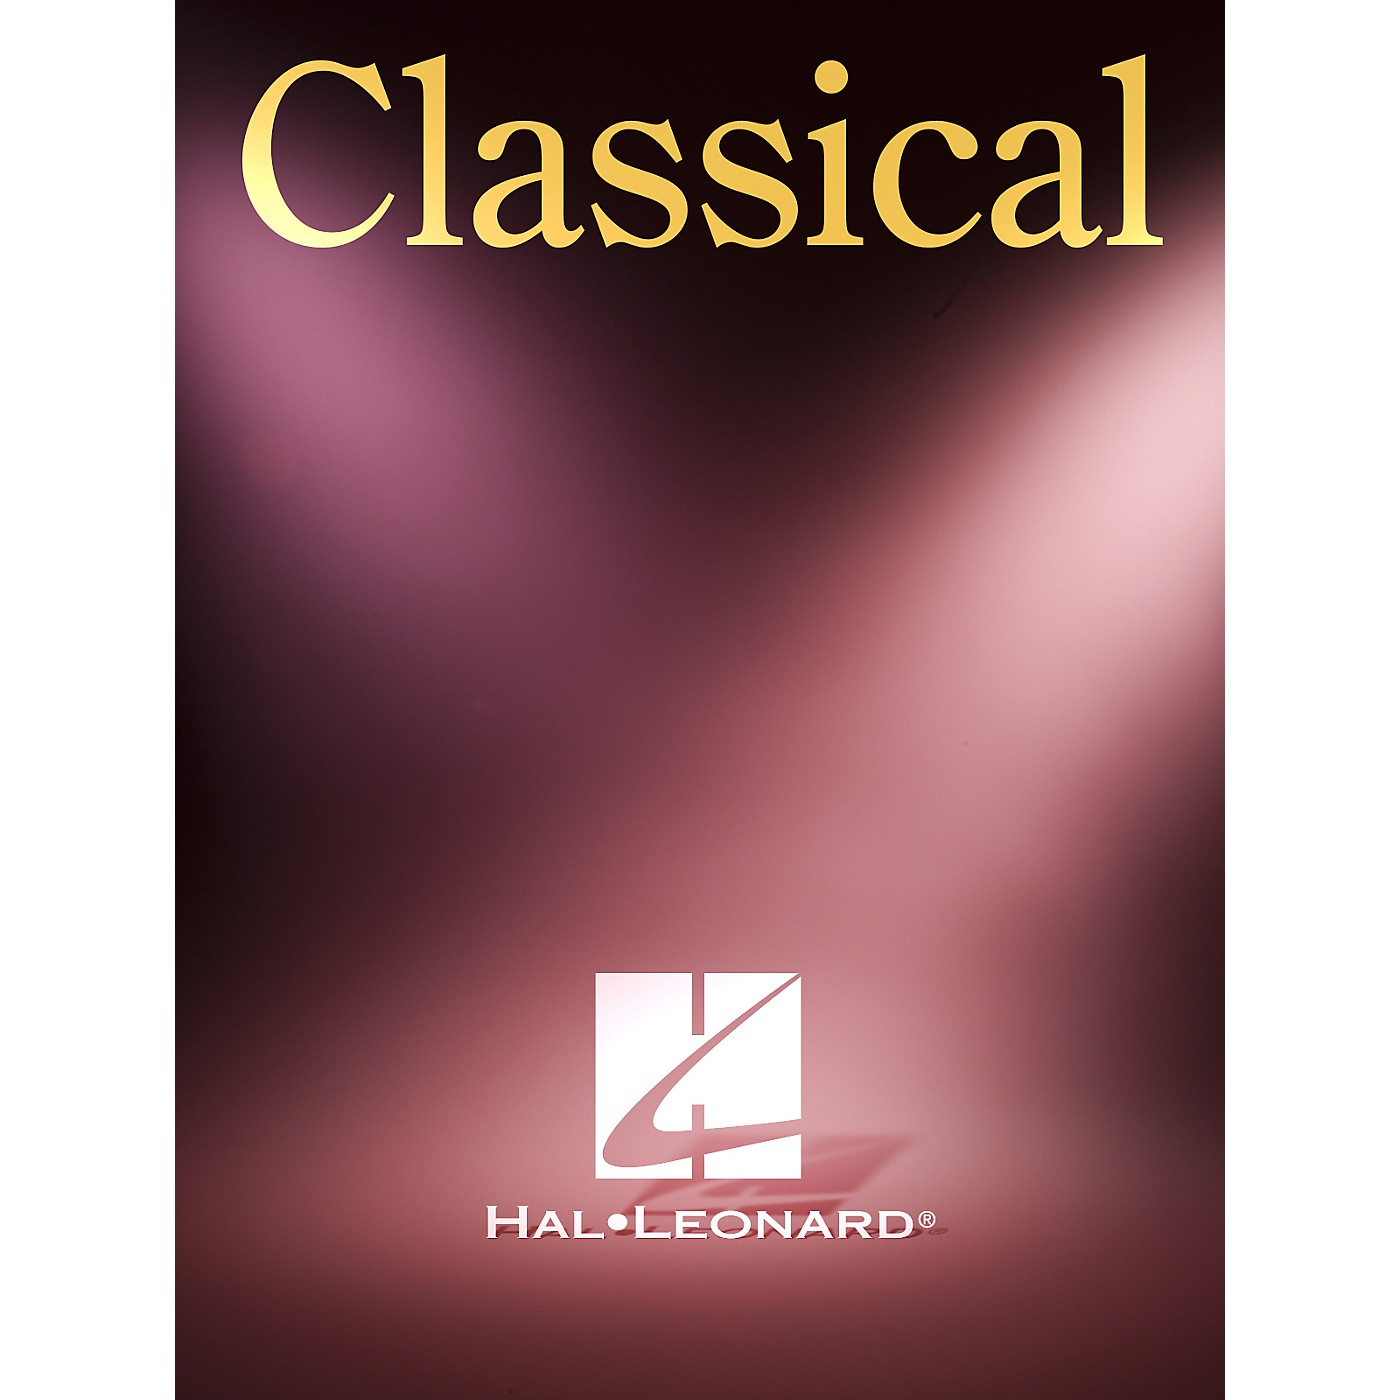 Hal Leonard Studi (chiesa) Suvini Zerboni Series thumbnail